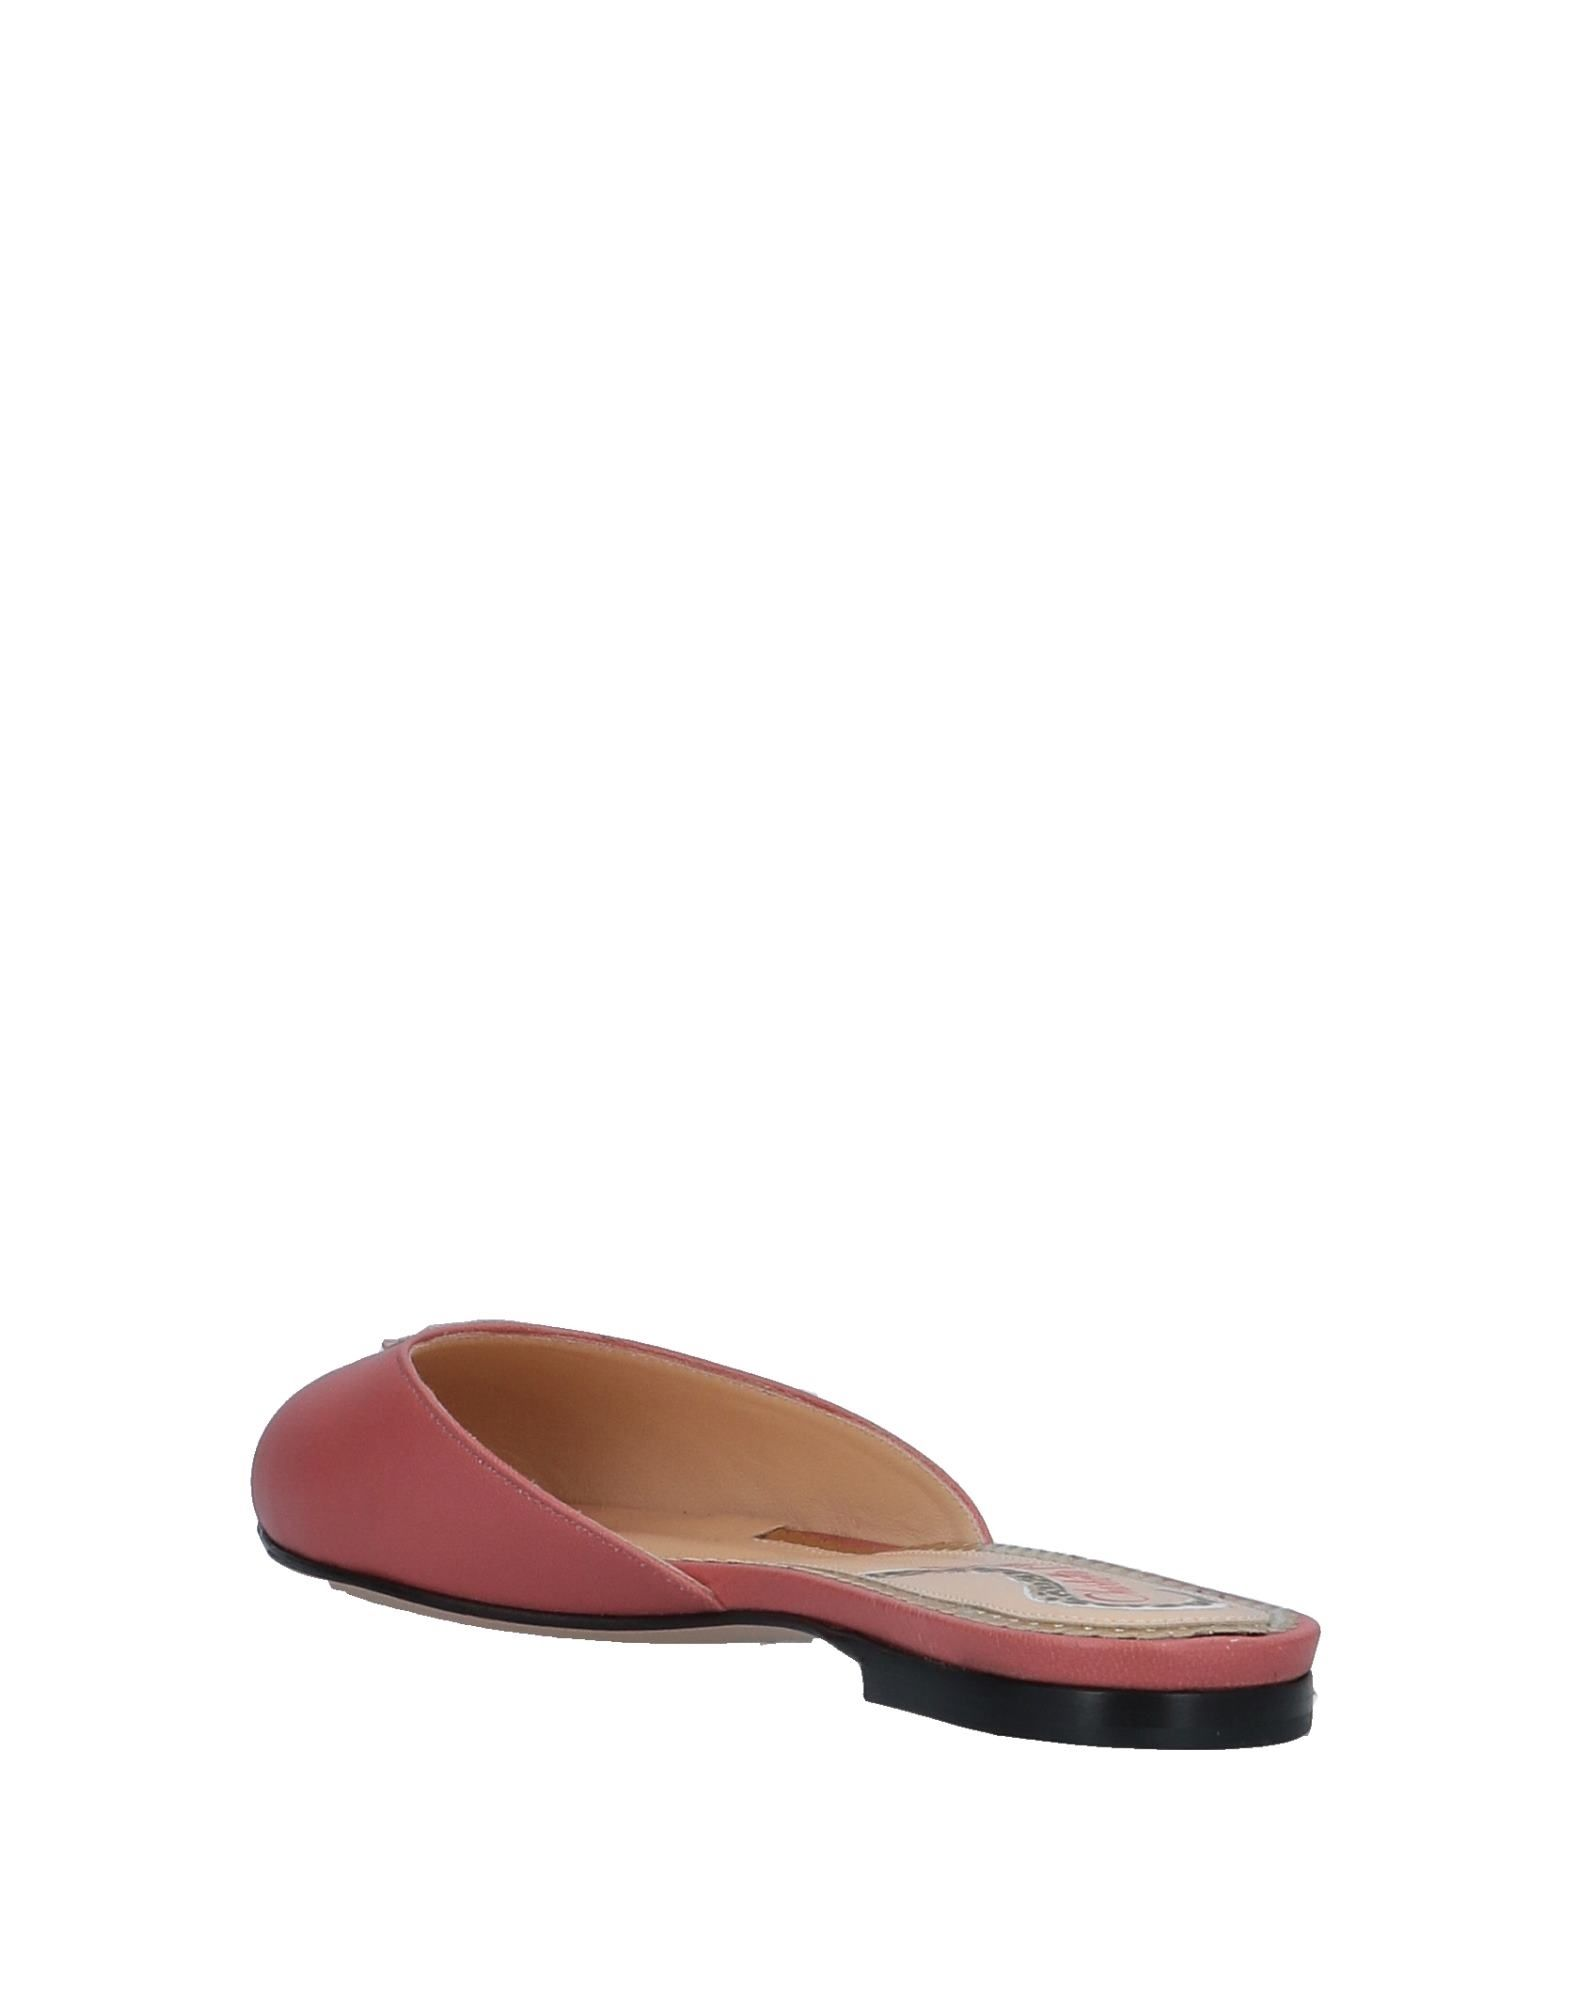 Rabatt Schuhe  Charlotte Olympia Pantoletten Damen  Schuhe 11544272HR 1e72c8